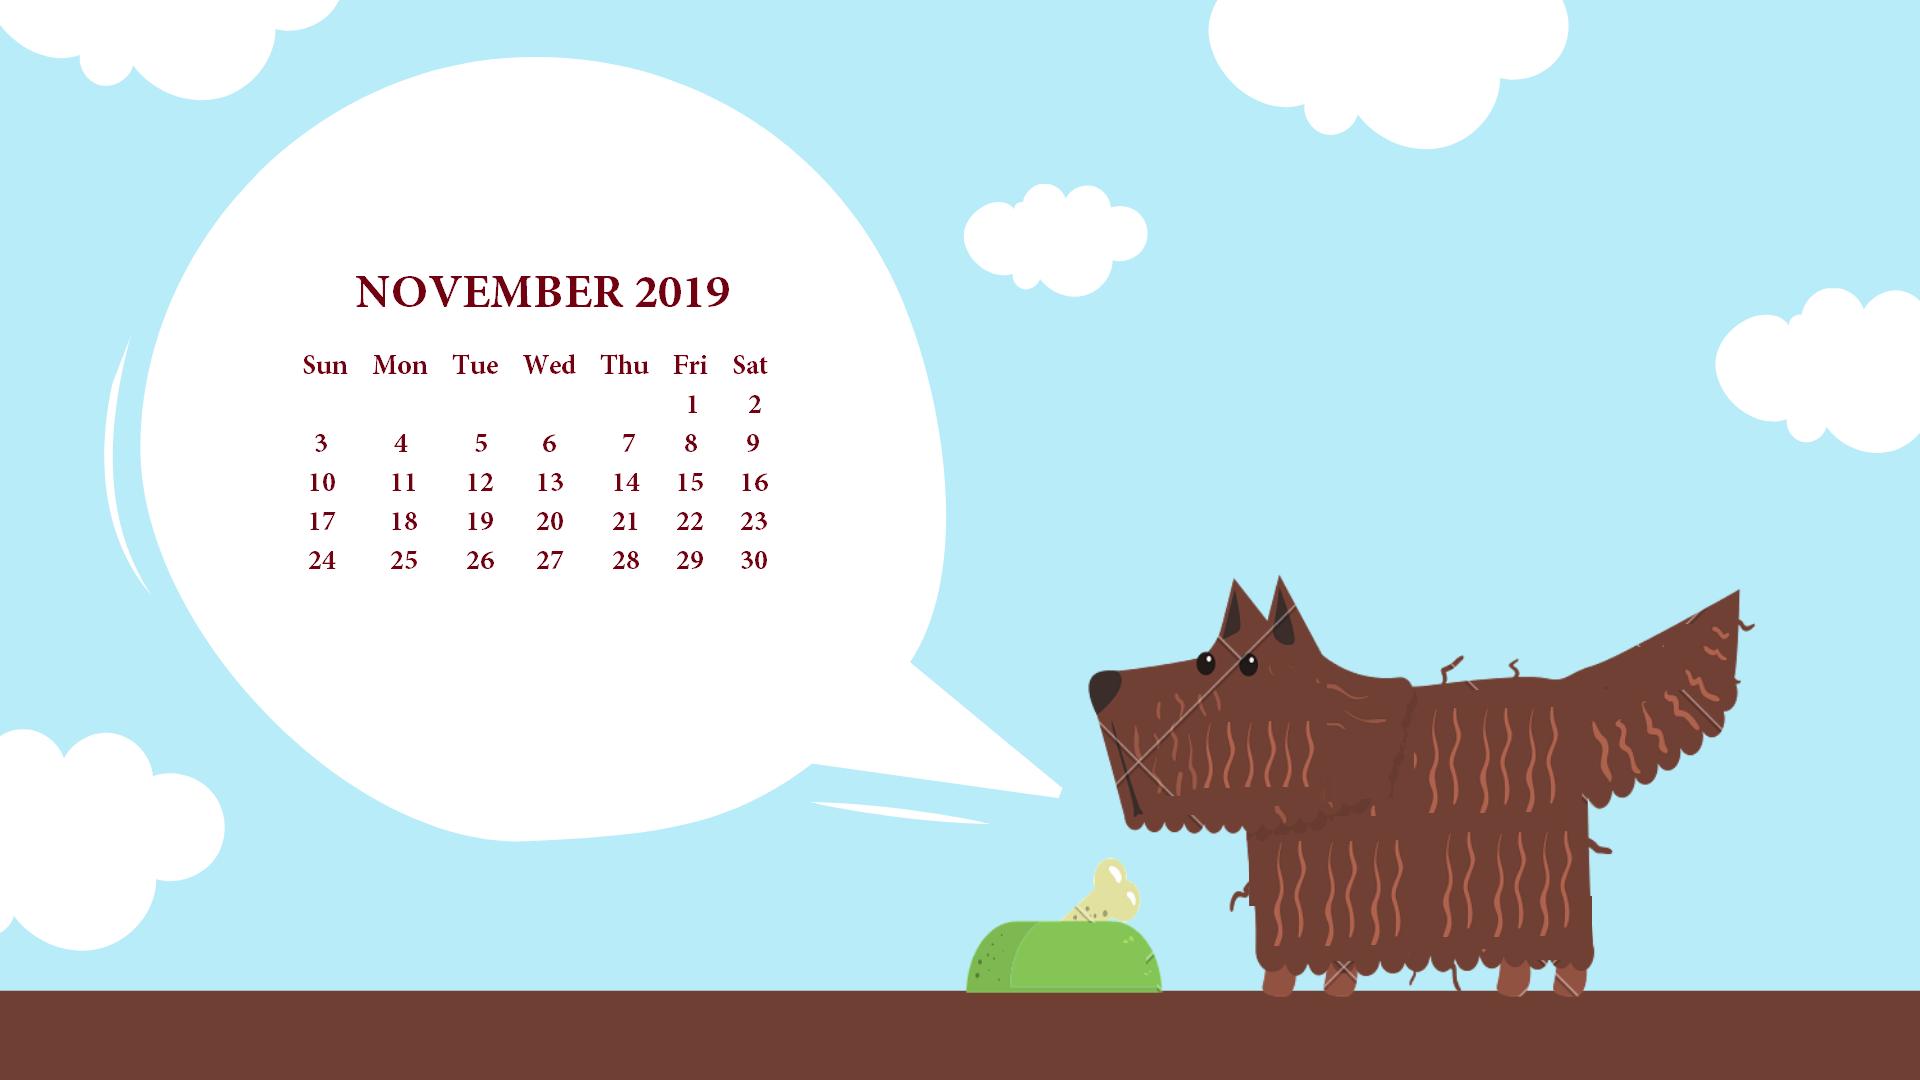 November 2019 Desktop Calendar Wallpaper